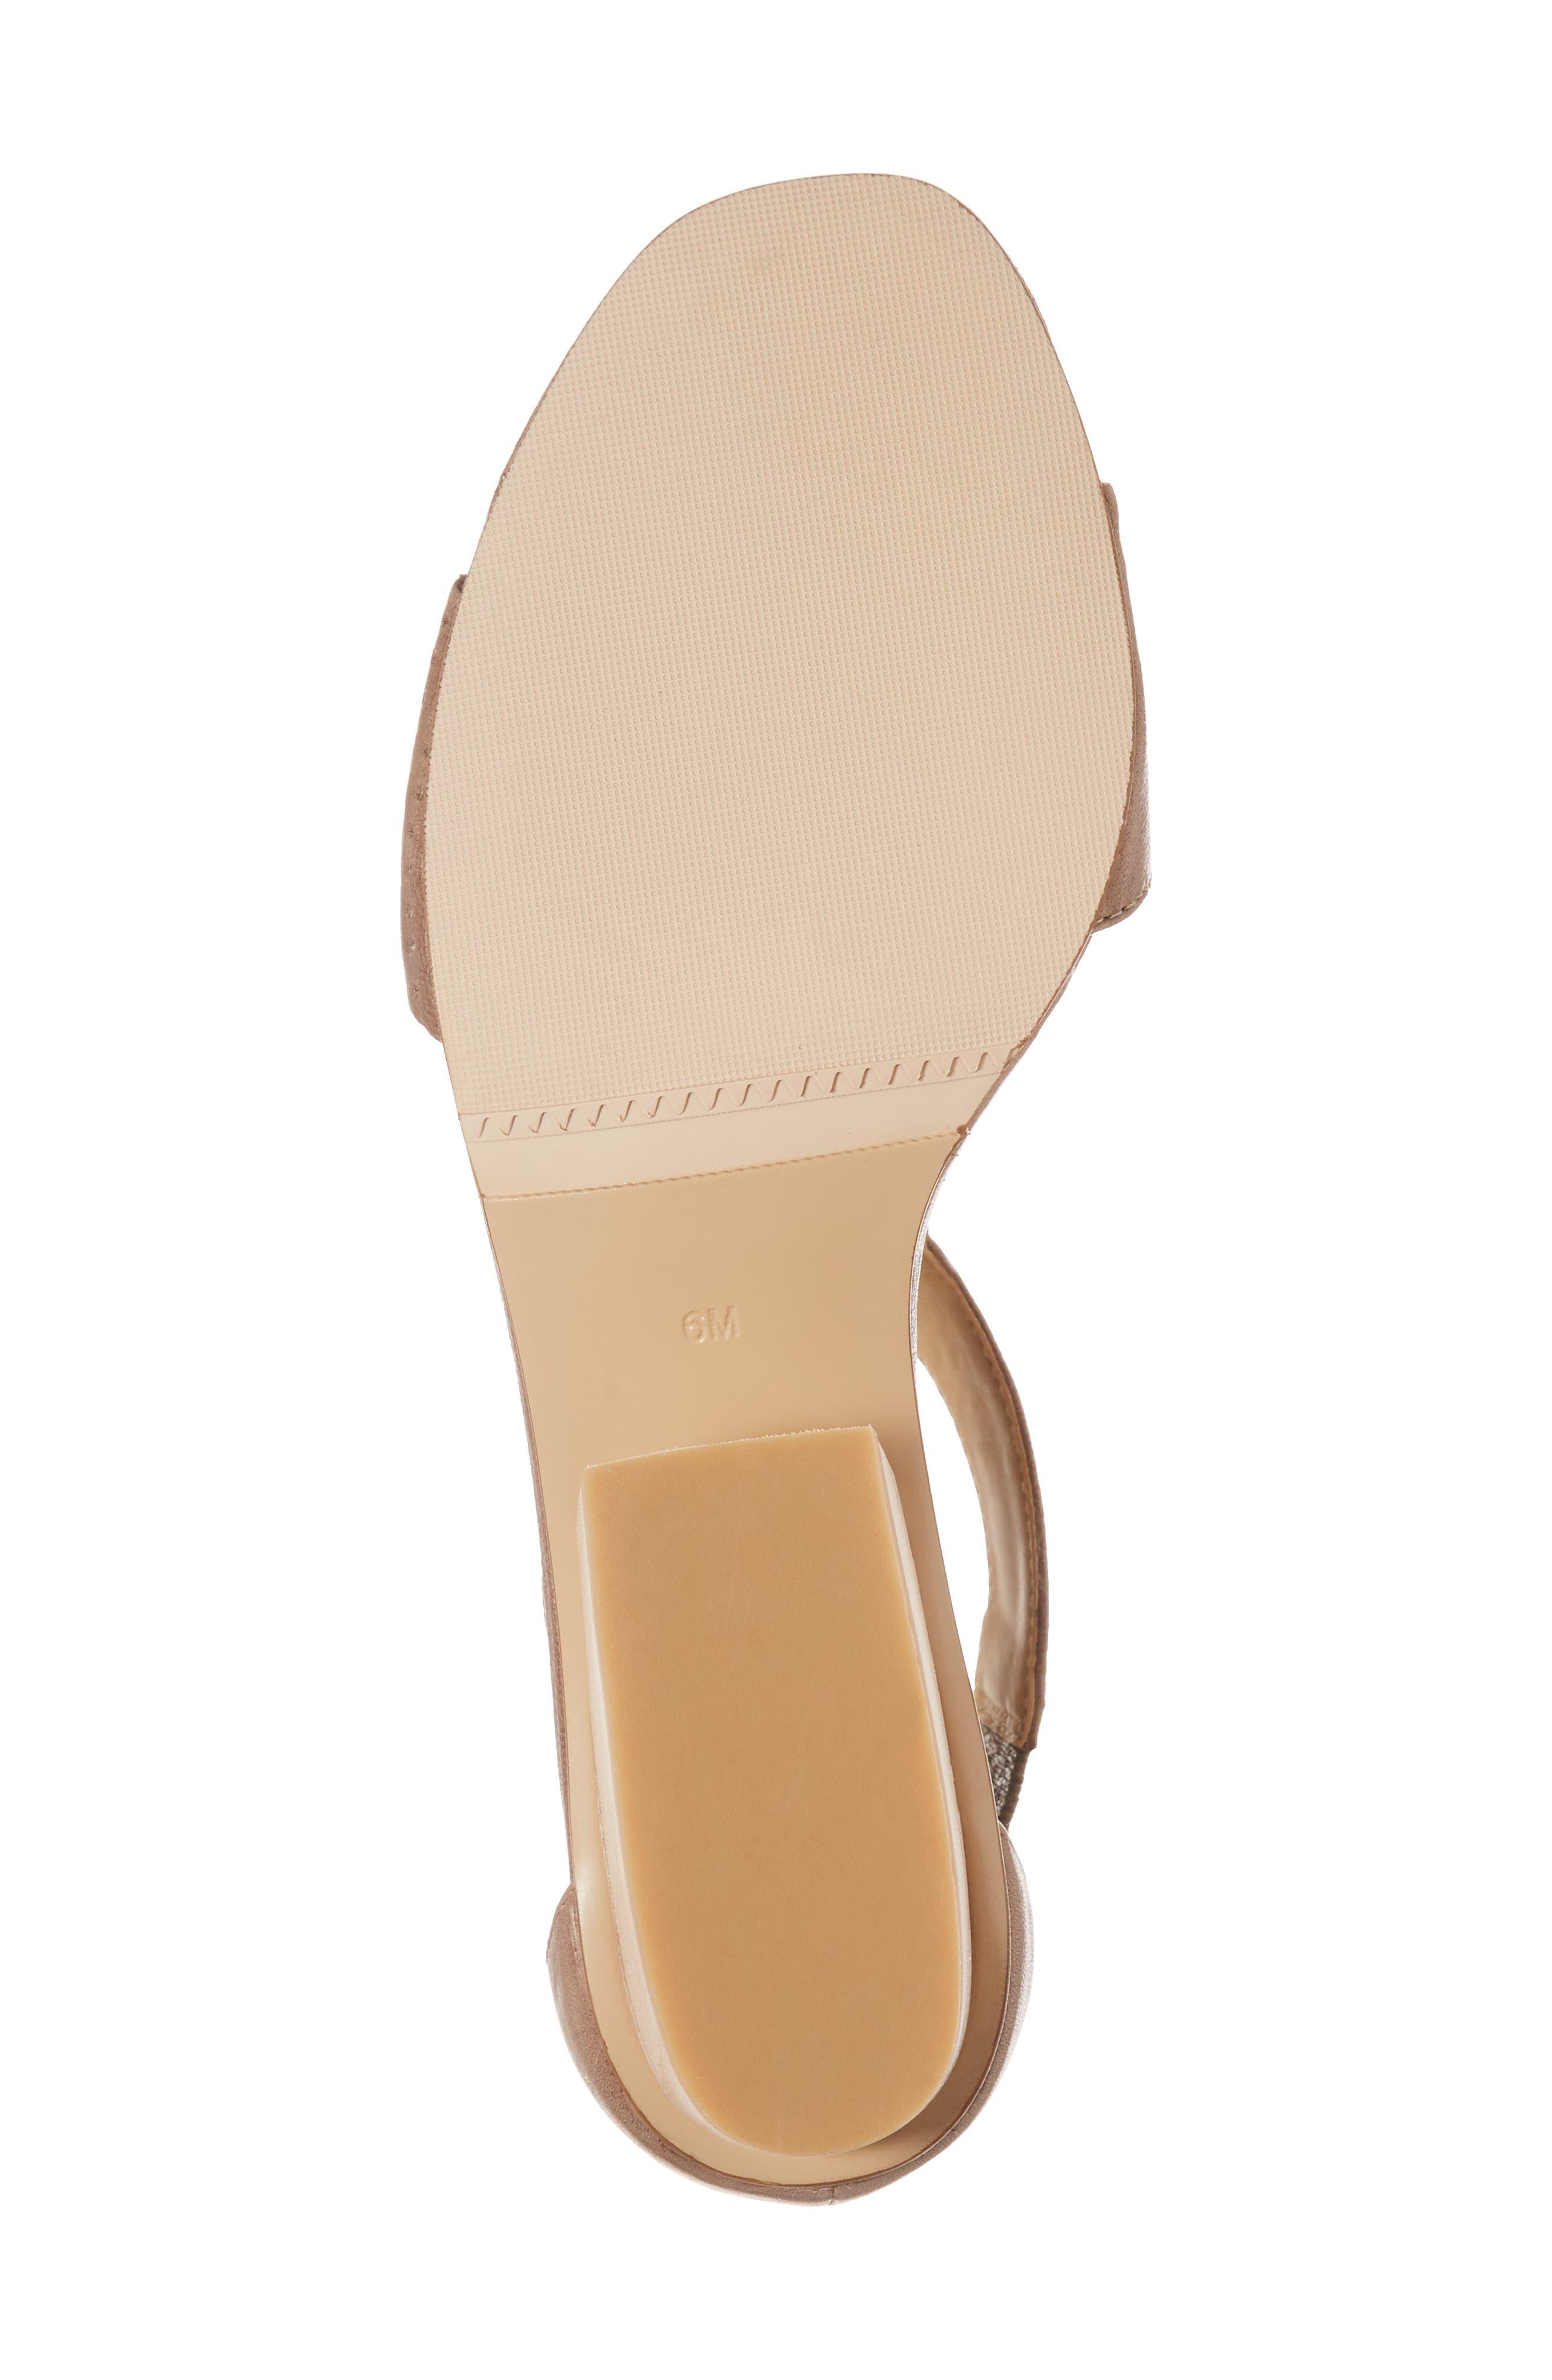 VANELI, Calyx Block Heel Sandal, Alternate thumbnail 6, color, STONE LEATHER